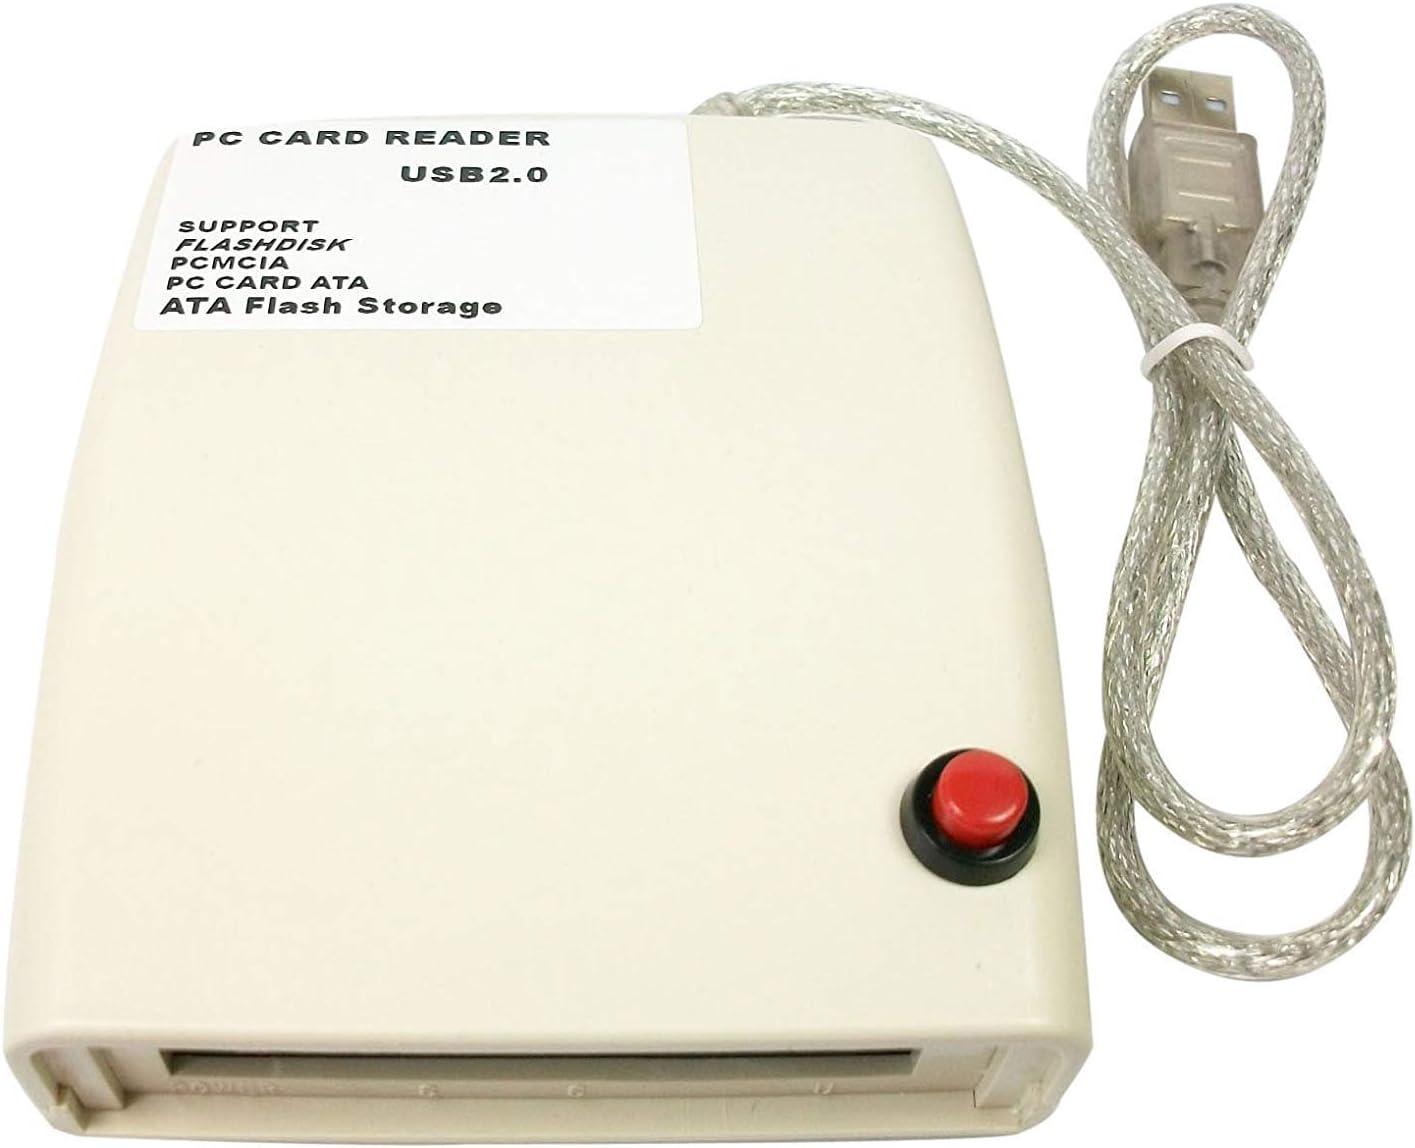 SZBJ USB2.0 Interface PCMCIA Card Reader,Read Flashdisk,PCMCIA,PC Card ATA,Mass Storage ATA Flash,PC Card